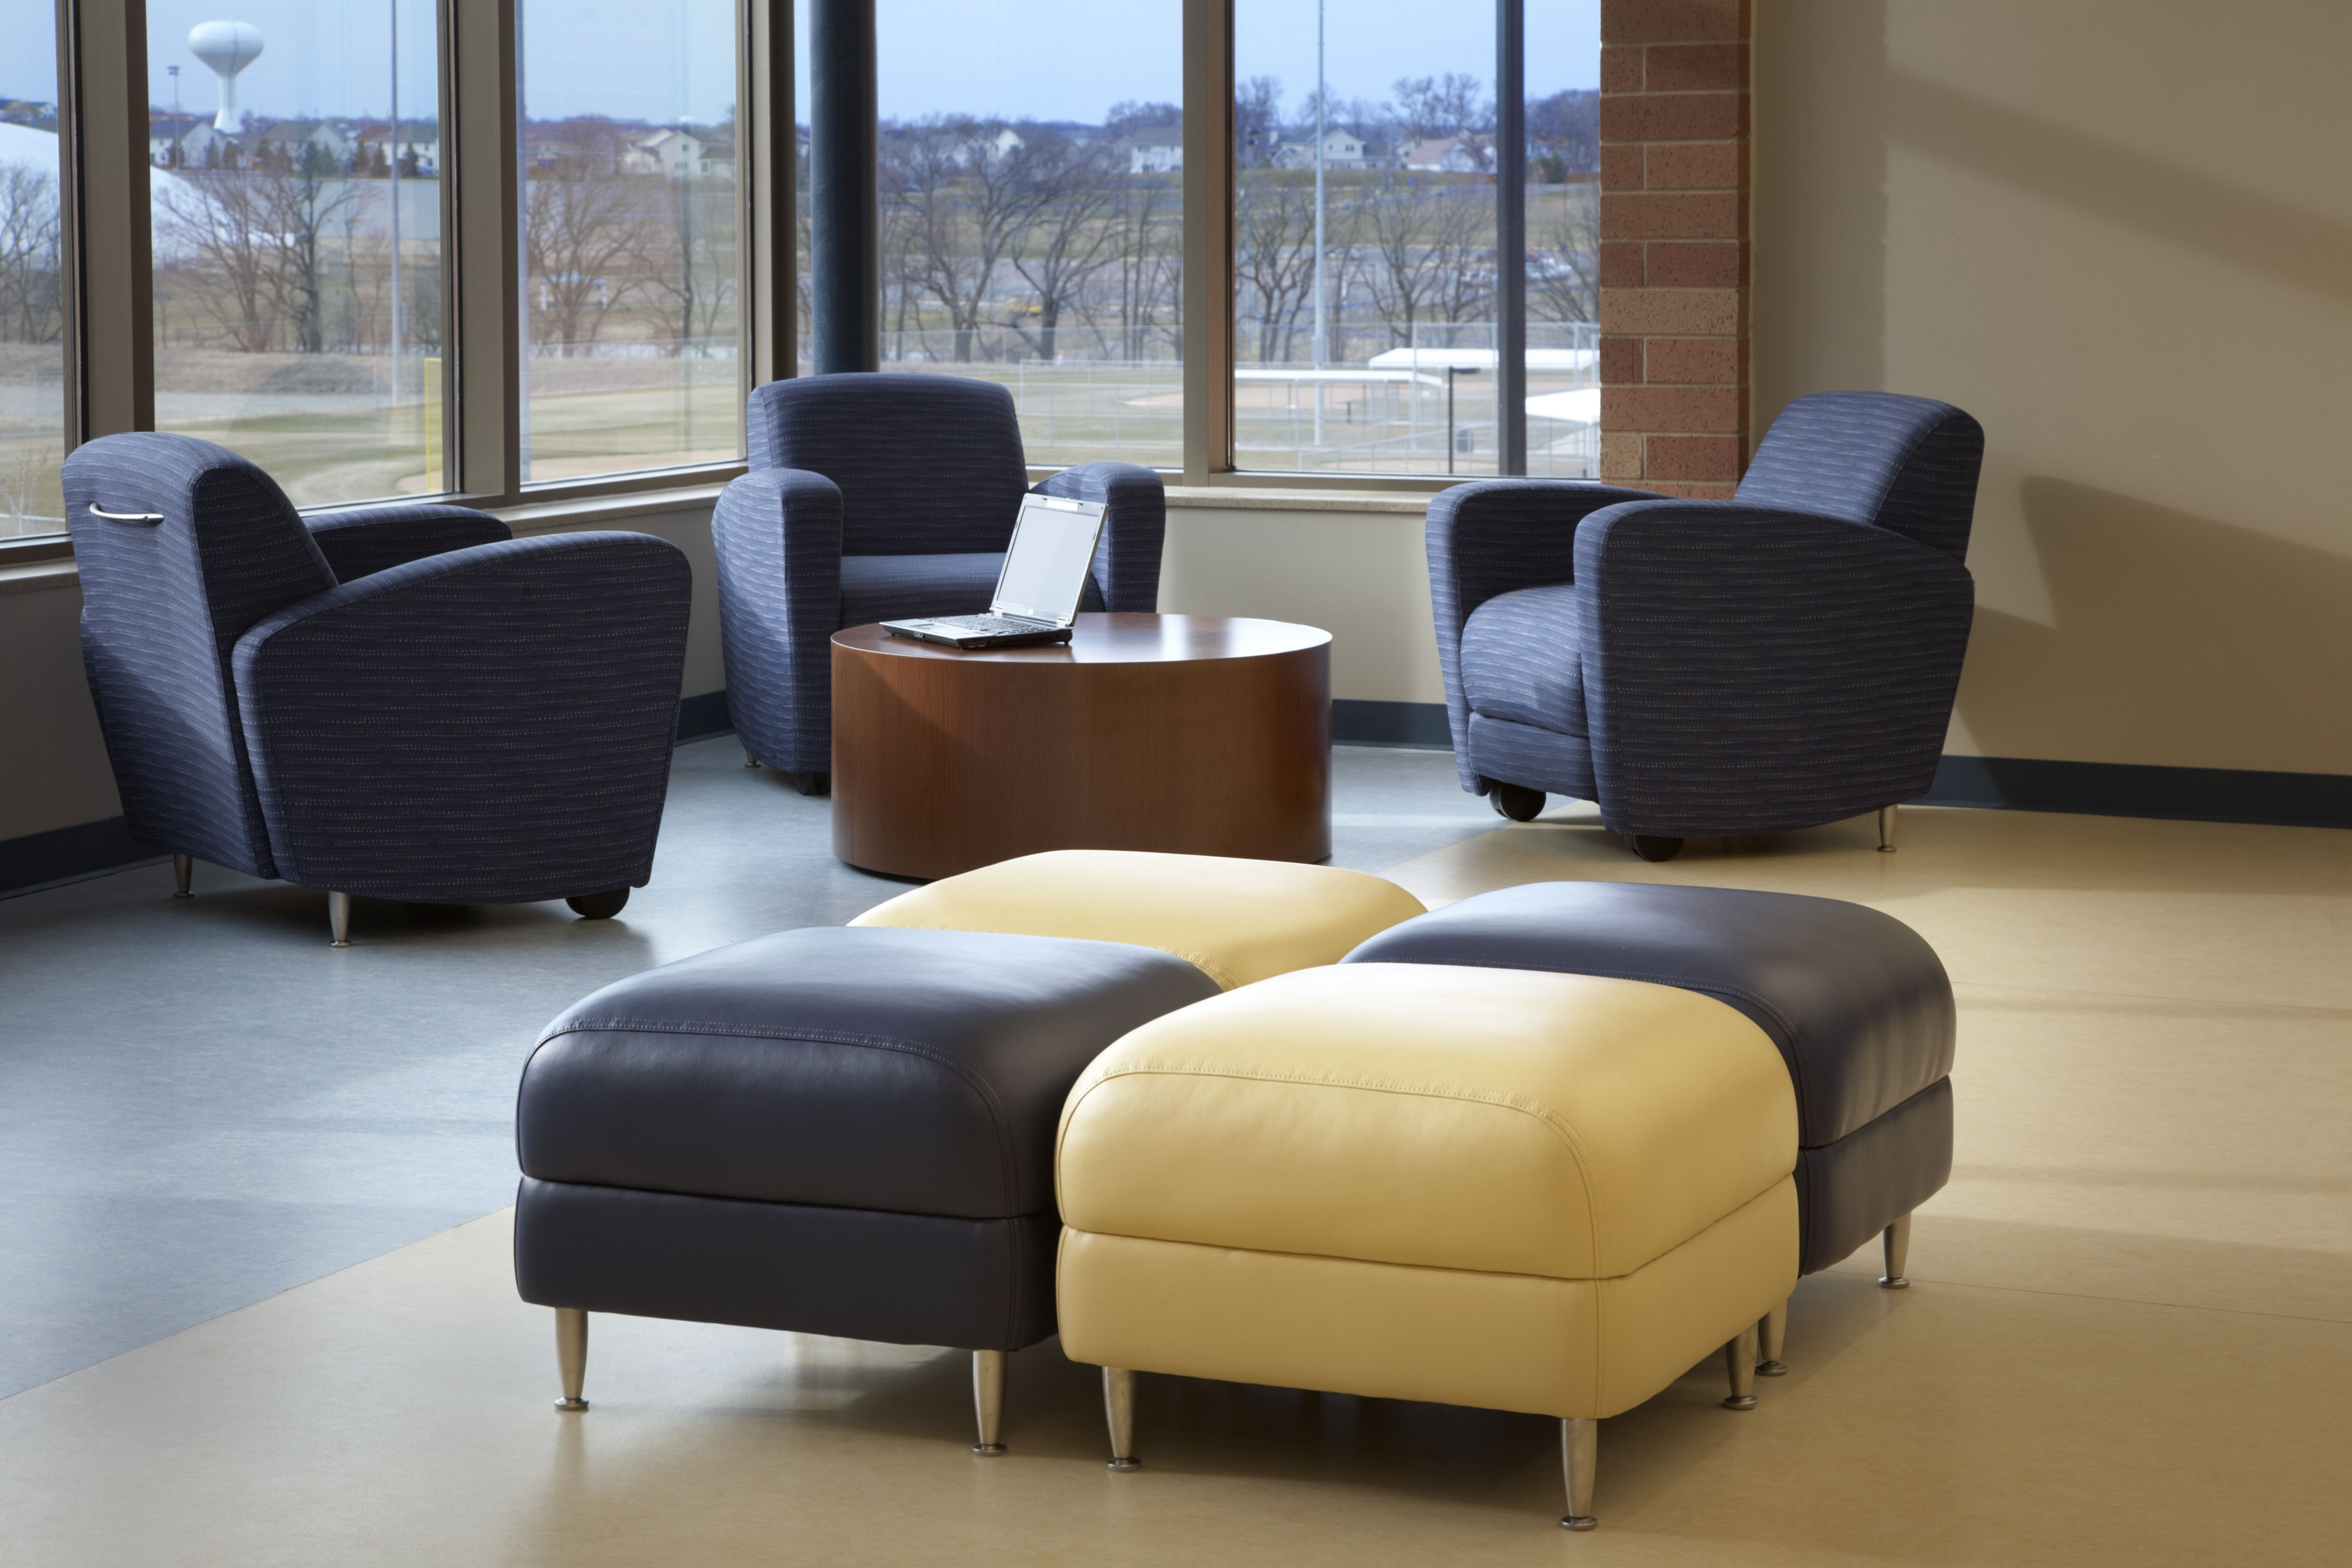 East Ridge High School Woodbury Mn Swift Lounge Seating In Lobby Reception Areanationaloffice